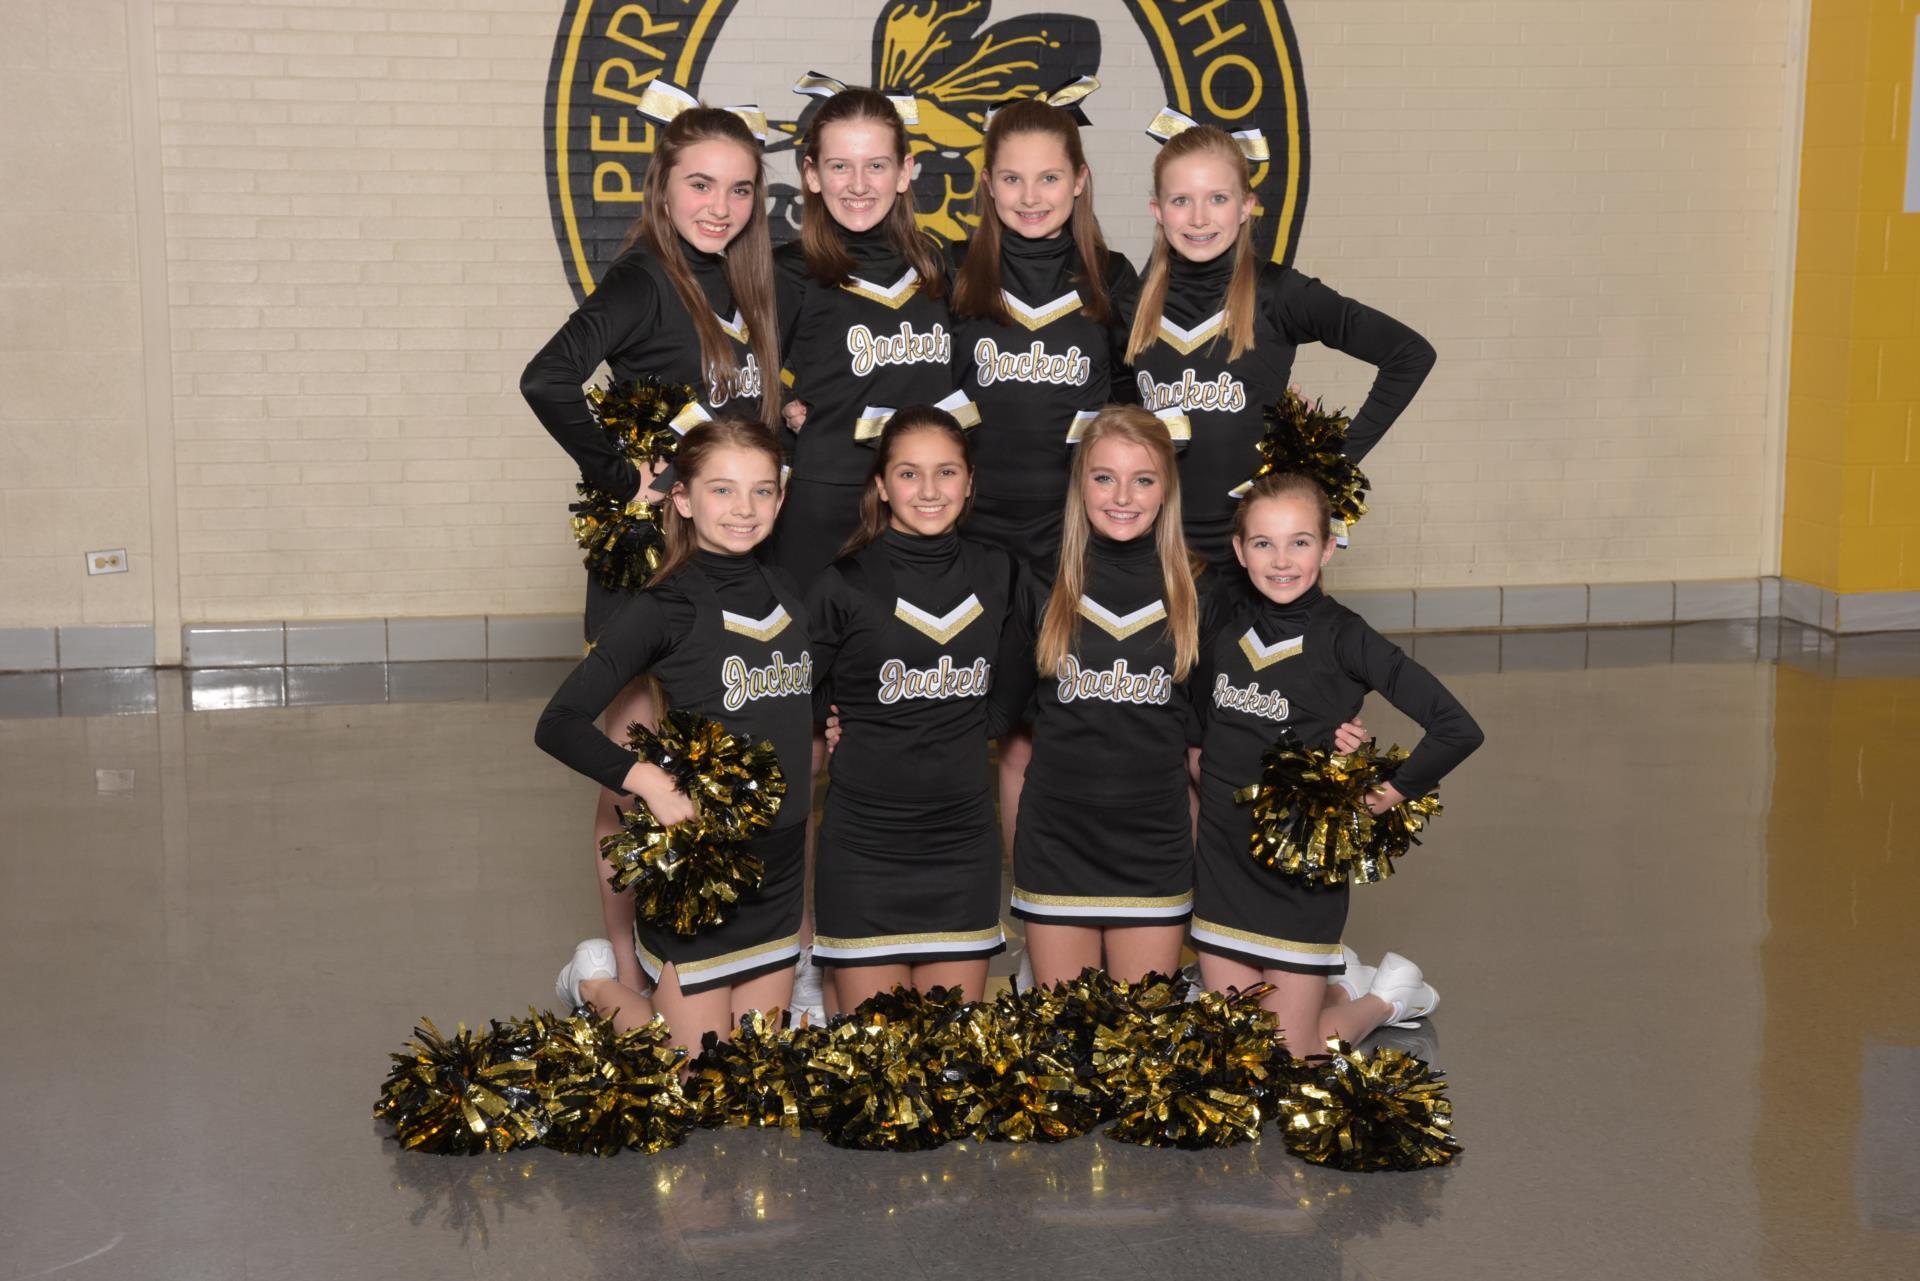 2017 7th grade basketball cheerleaders